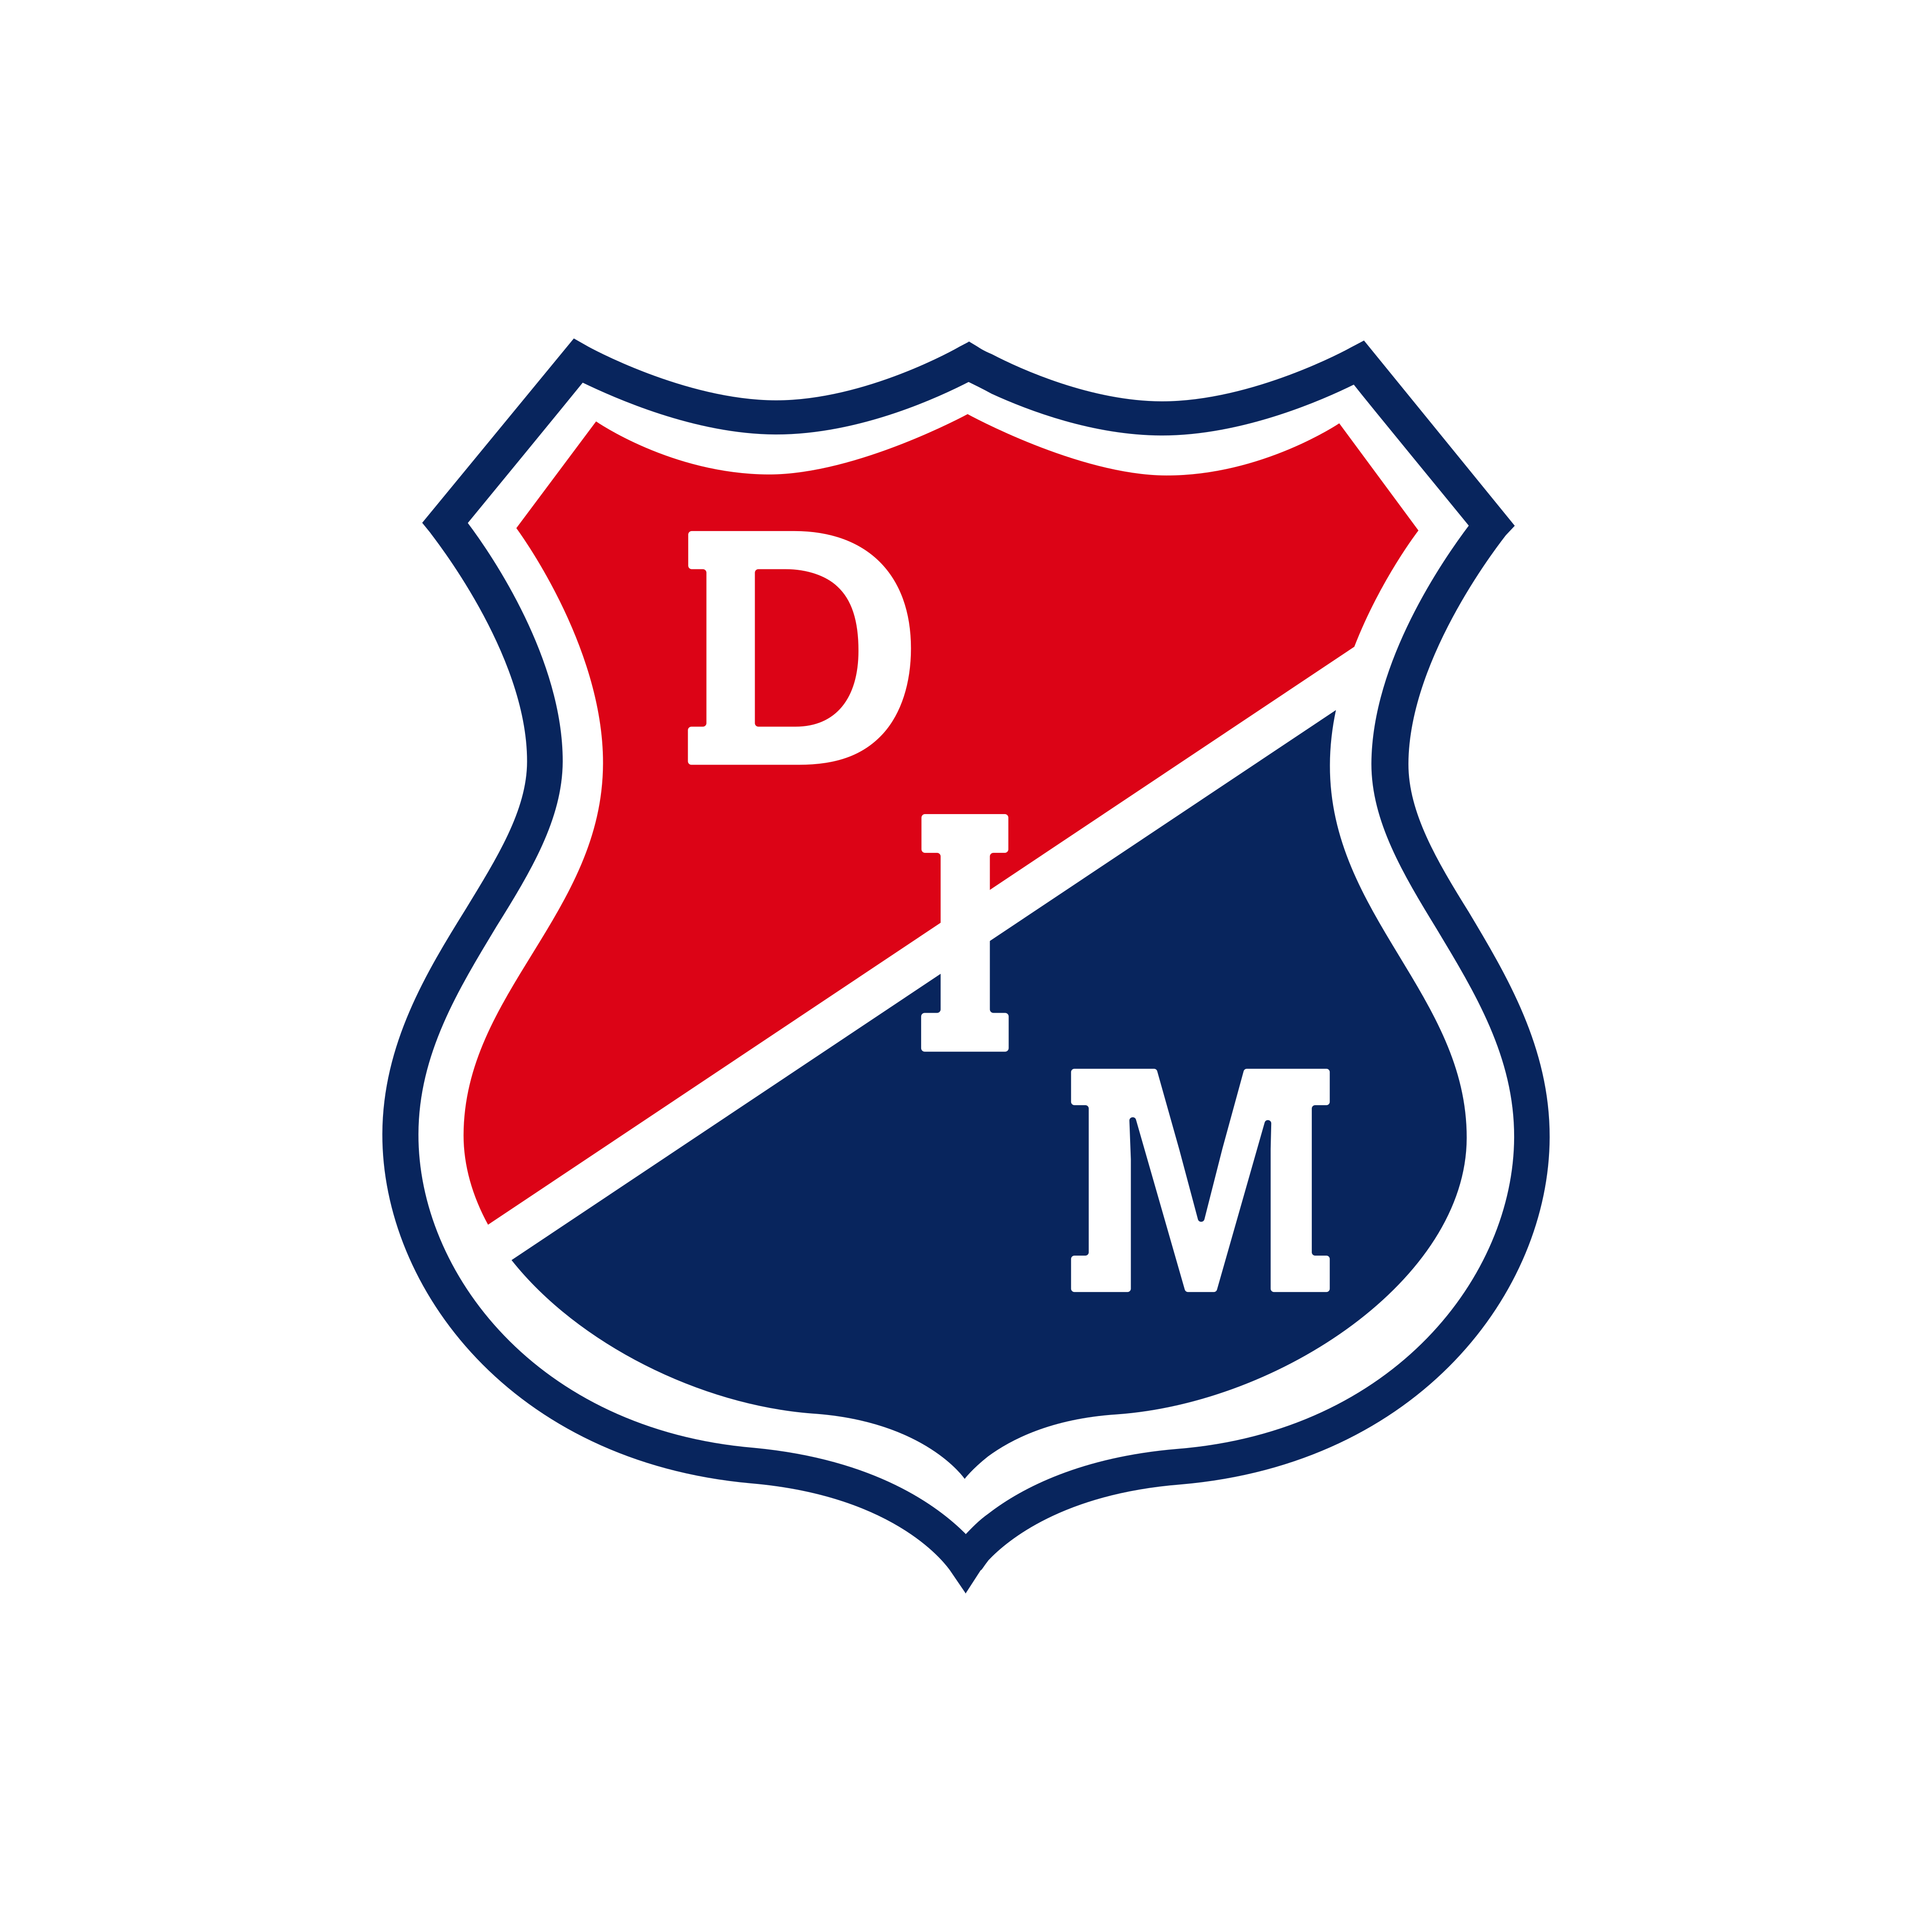 independiente medellin logo 0 - Independiente Medellín Logo